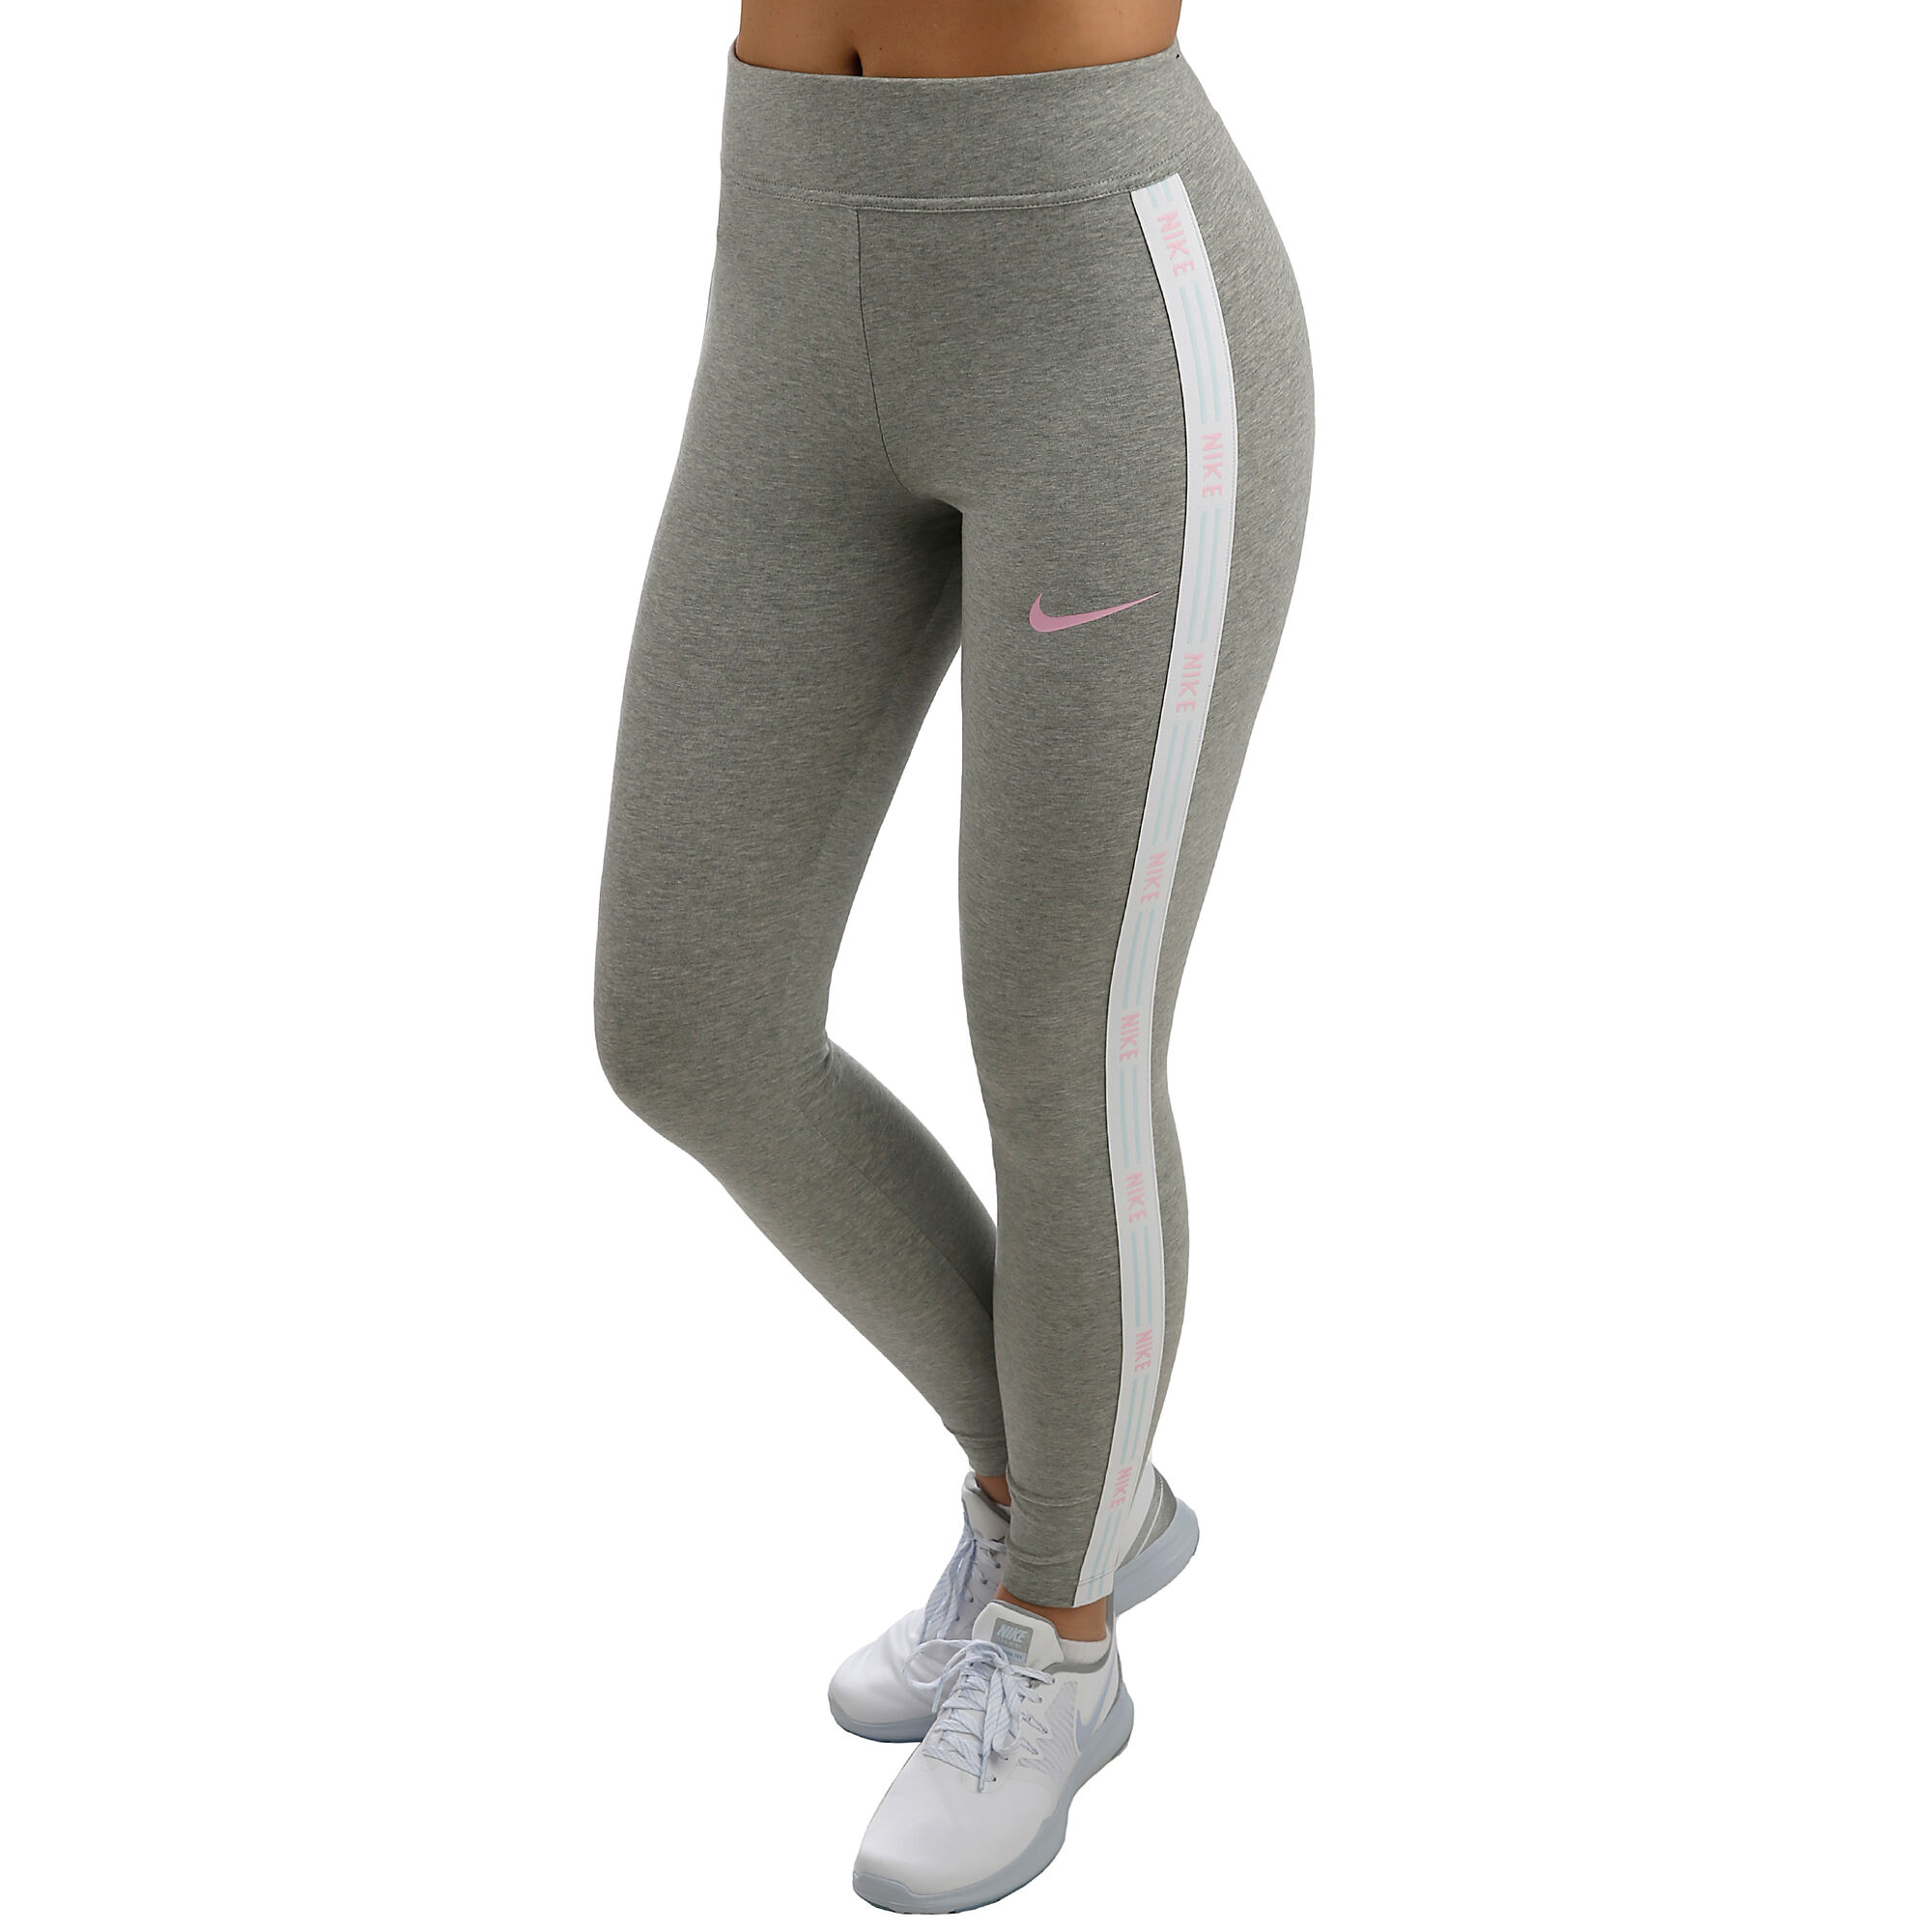 d90ec4d902ff Nike Sportswear Tights Damer - Grå, Rosa köp online | Tennis-Point